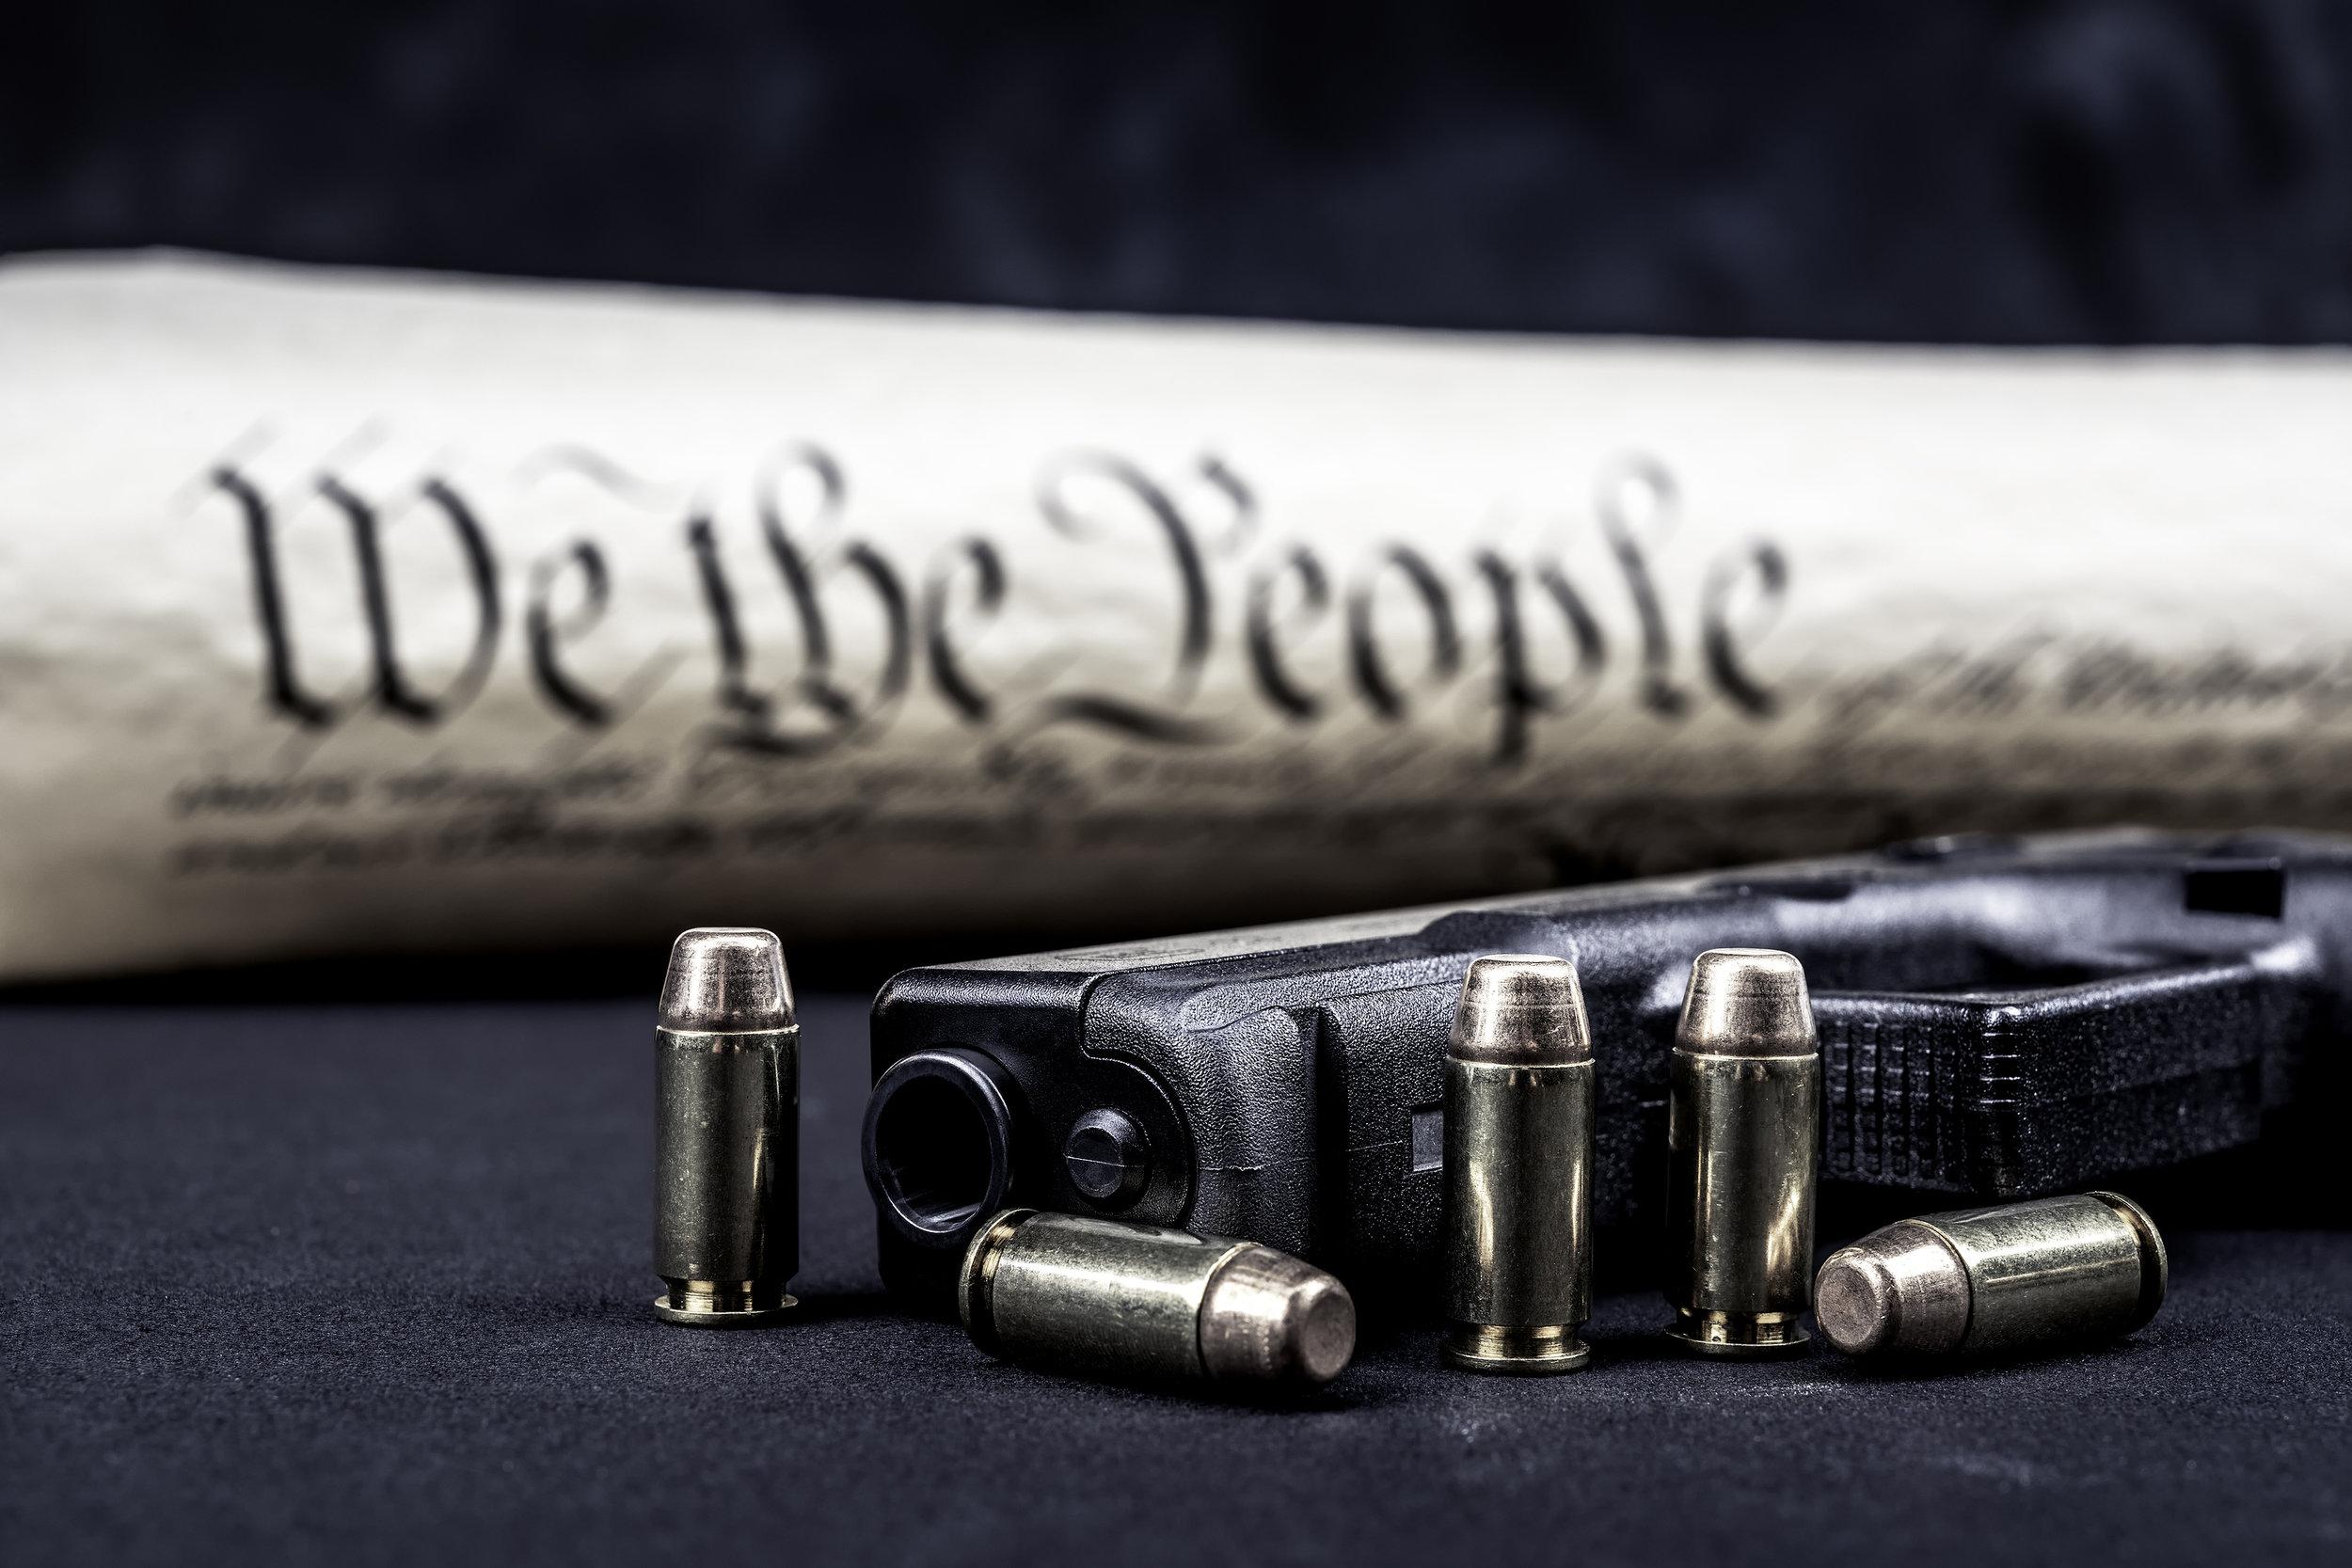 bigstock-A-handgun-with-bullets-symboli-191723428.jpg